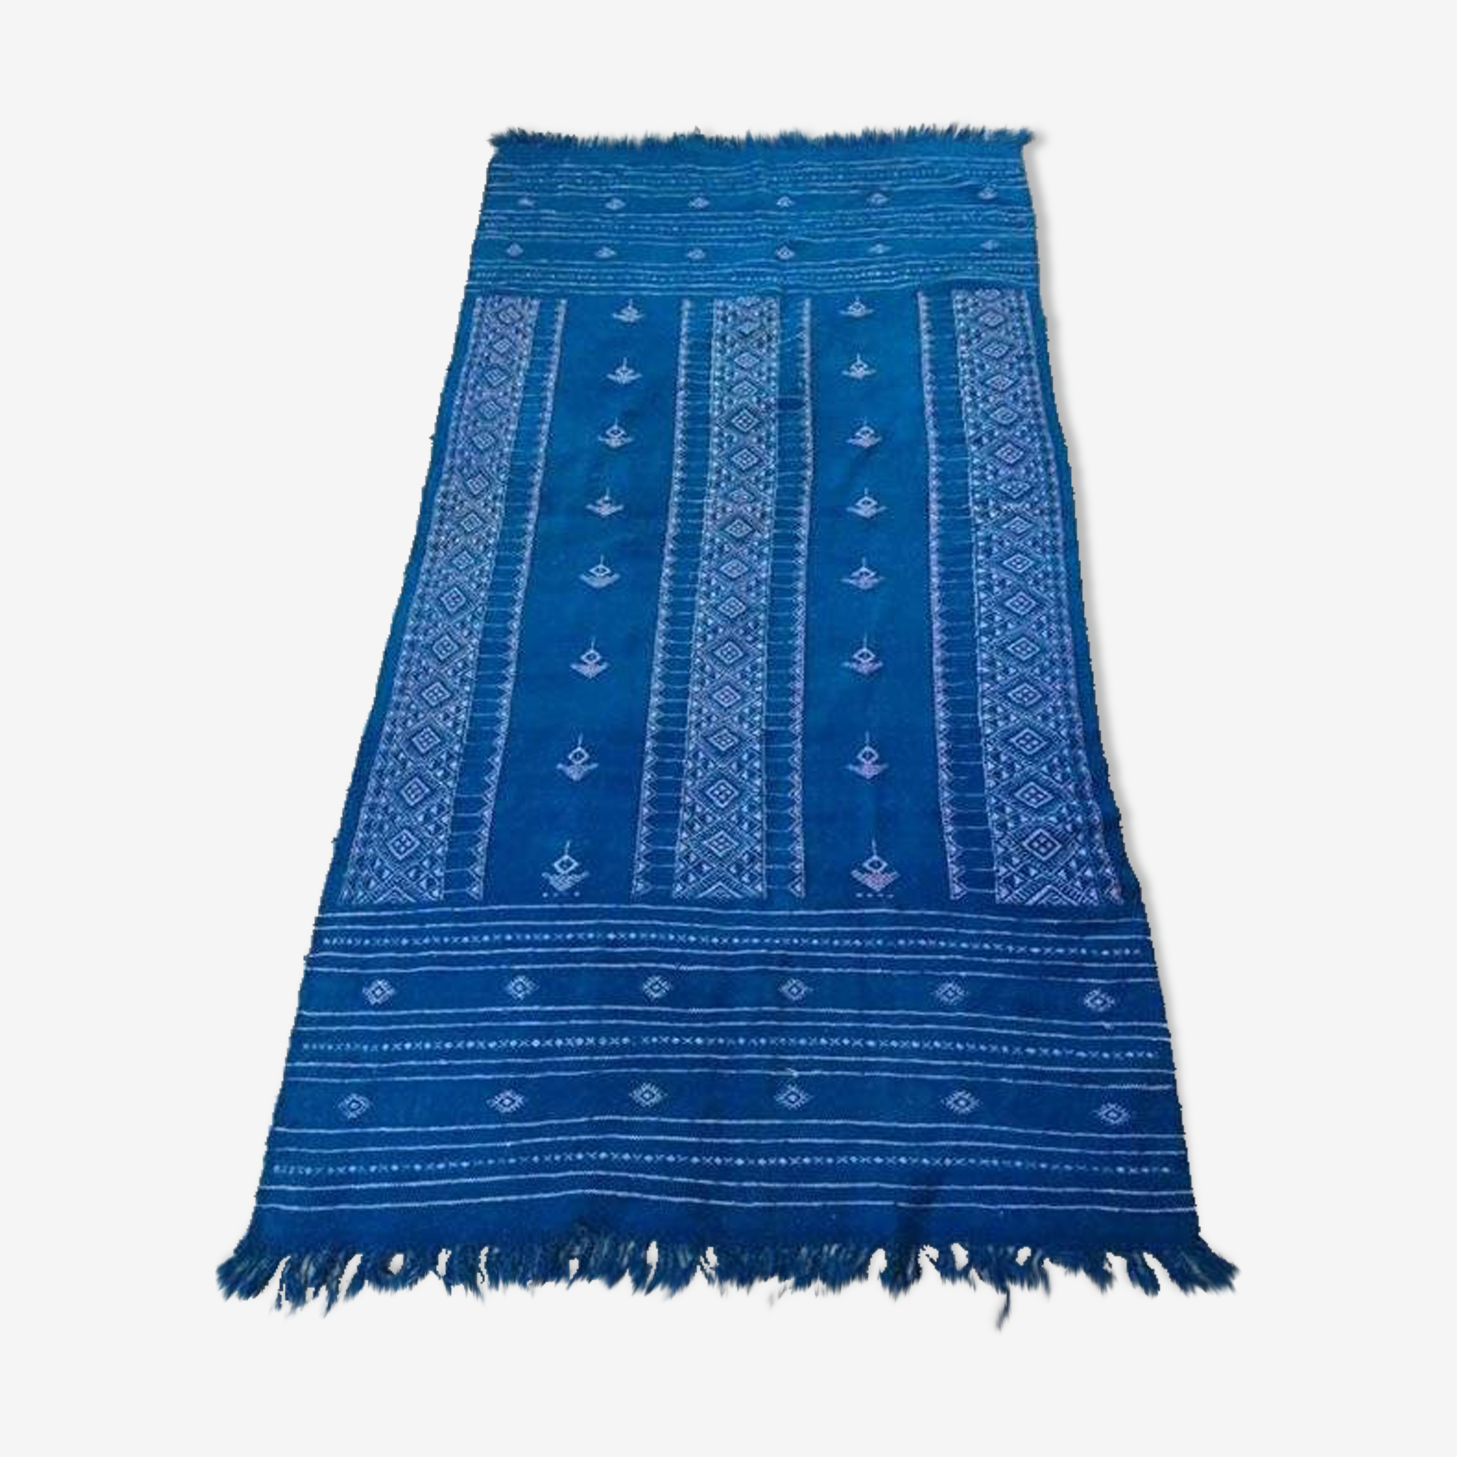 Tapis kilim berbère 200x100cm